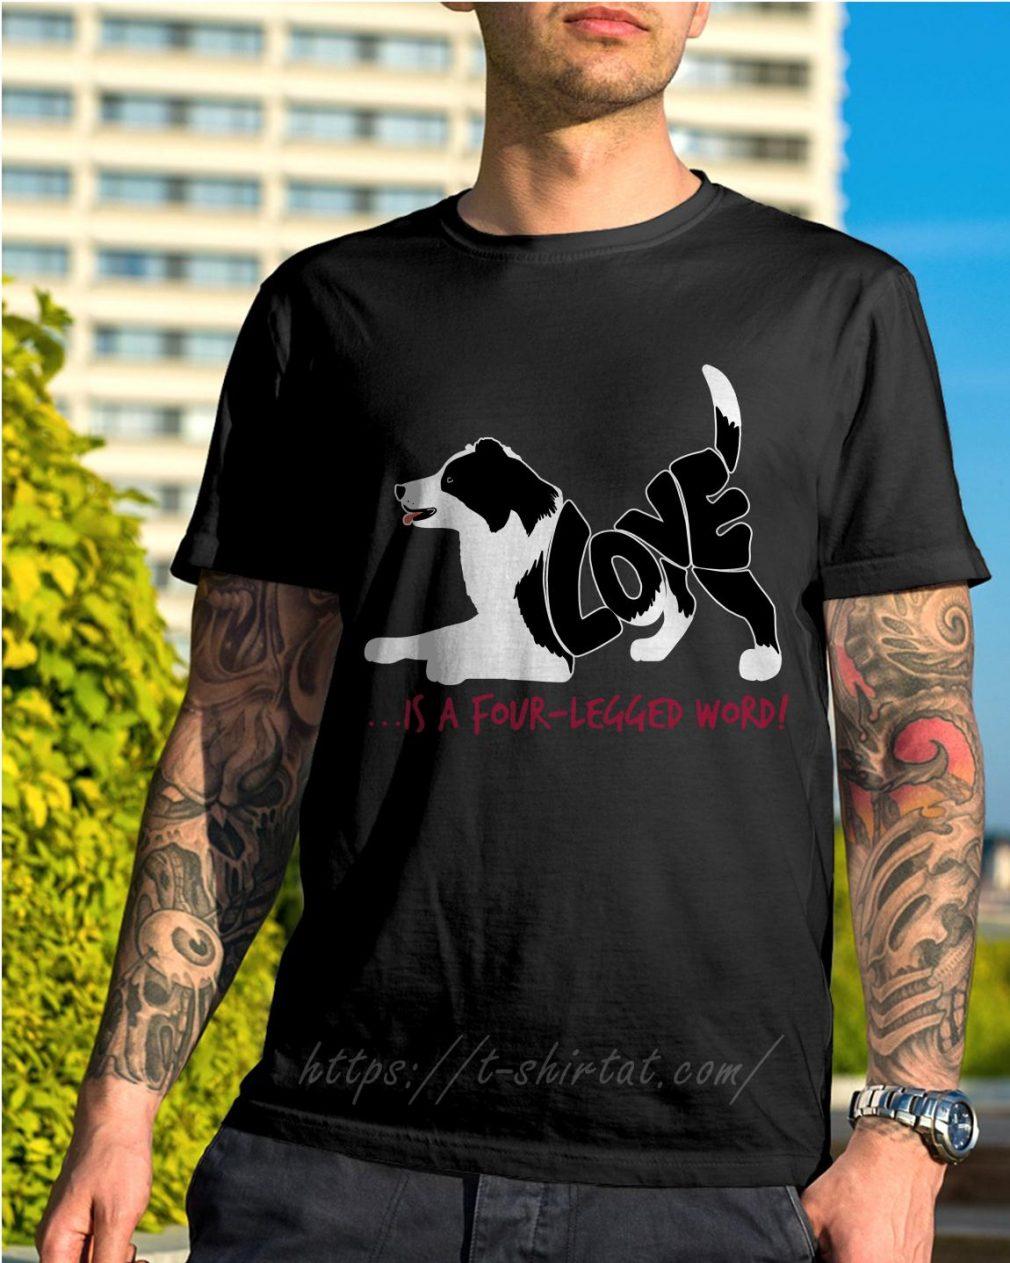 Dog love is a four-legged word shirt